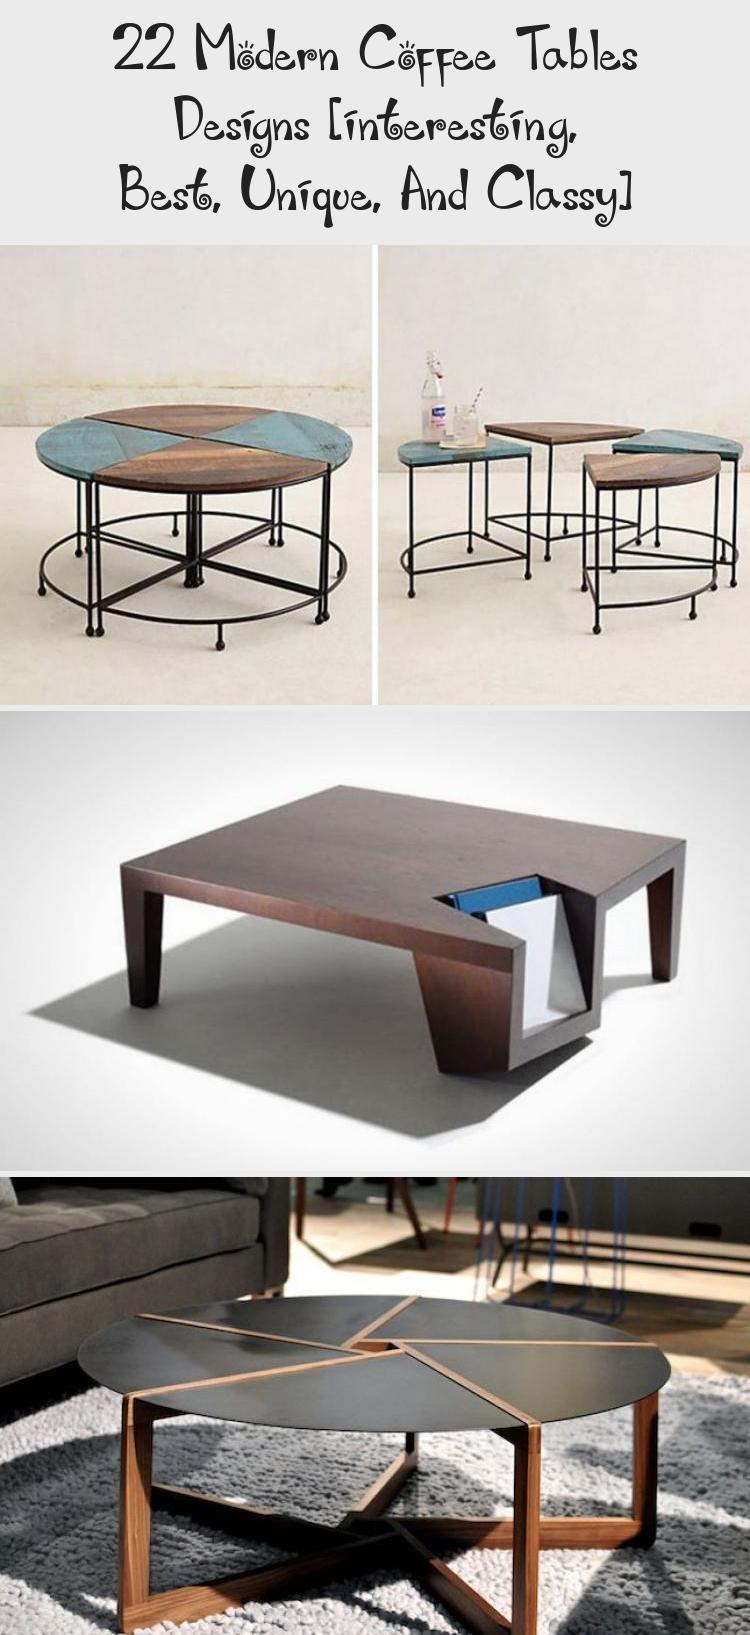 En Blog En Blog Wooden Coffee Table Designs Coffee Table Design Modern Modern Coffee Tables [ 1635 x 750 Pixel ]